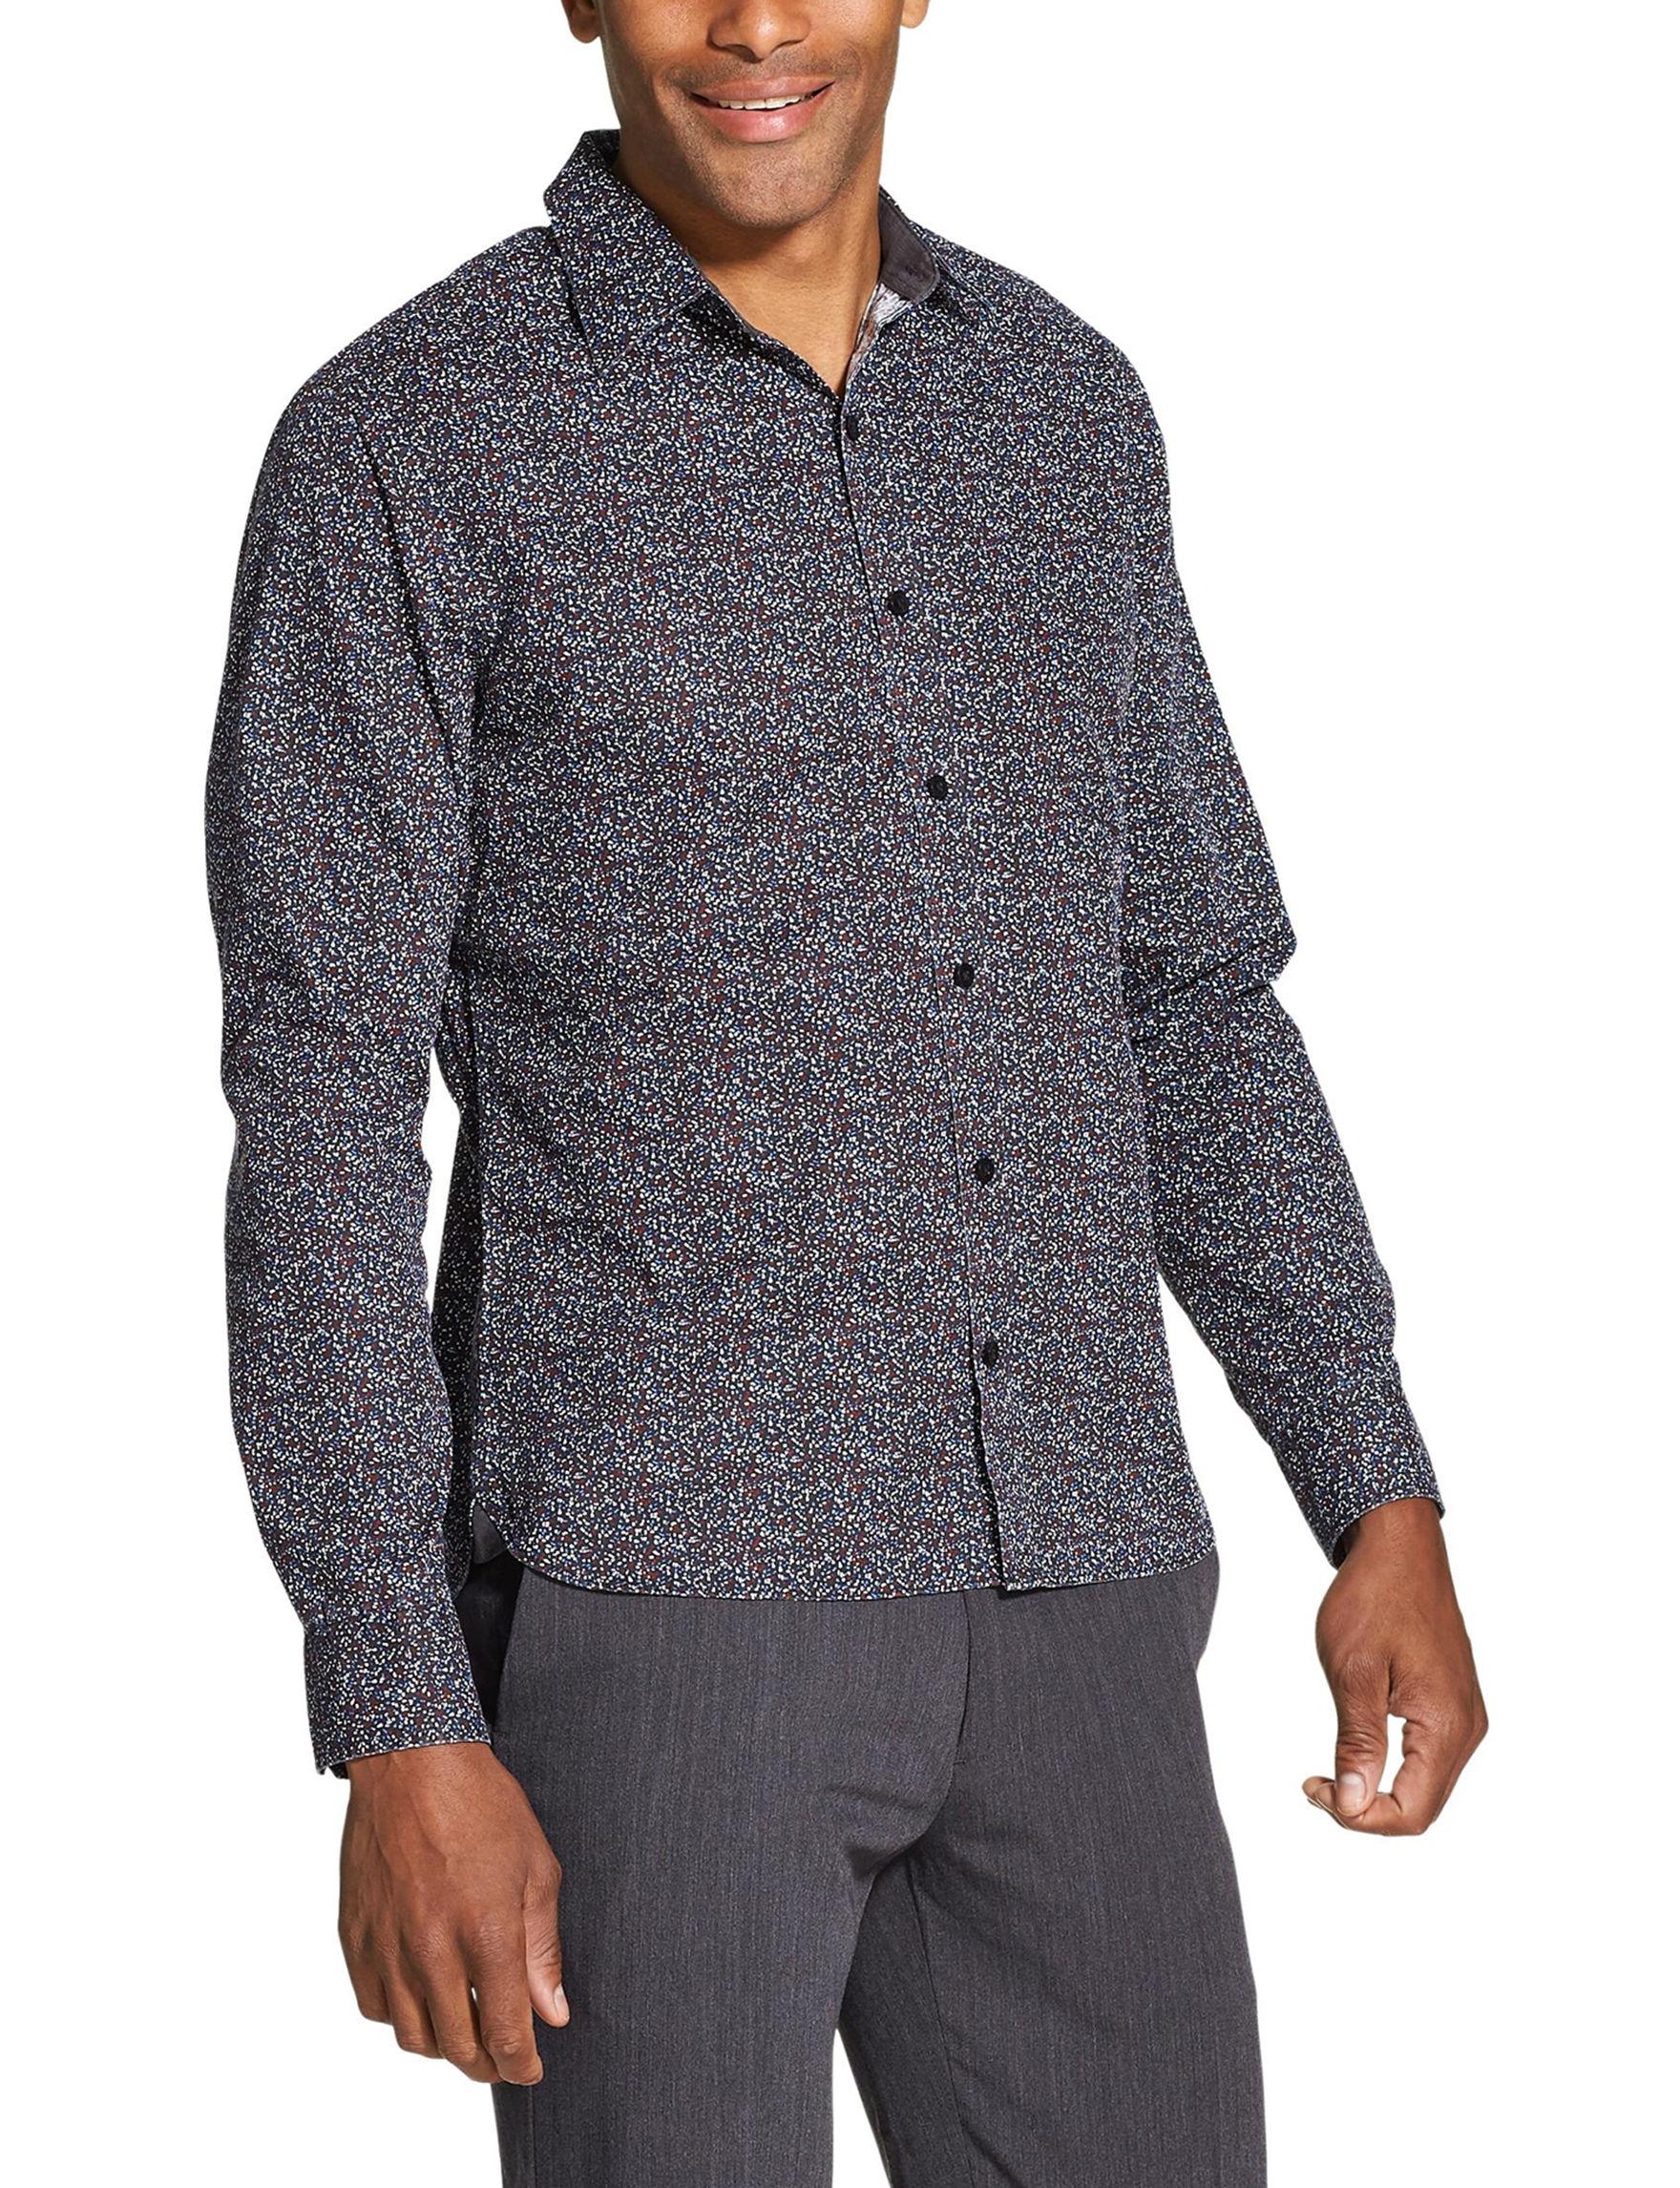 Van Heusen Black / Dots Casual Button Down Shirts